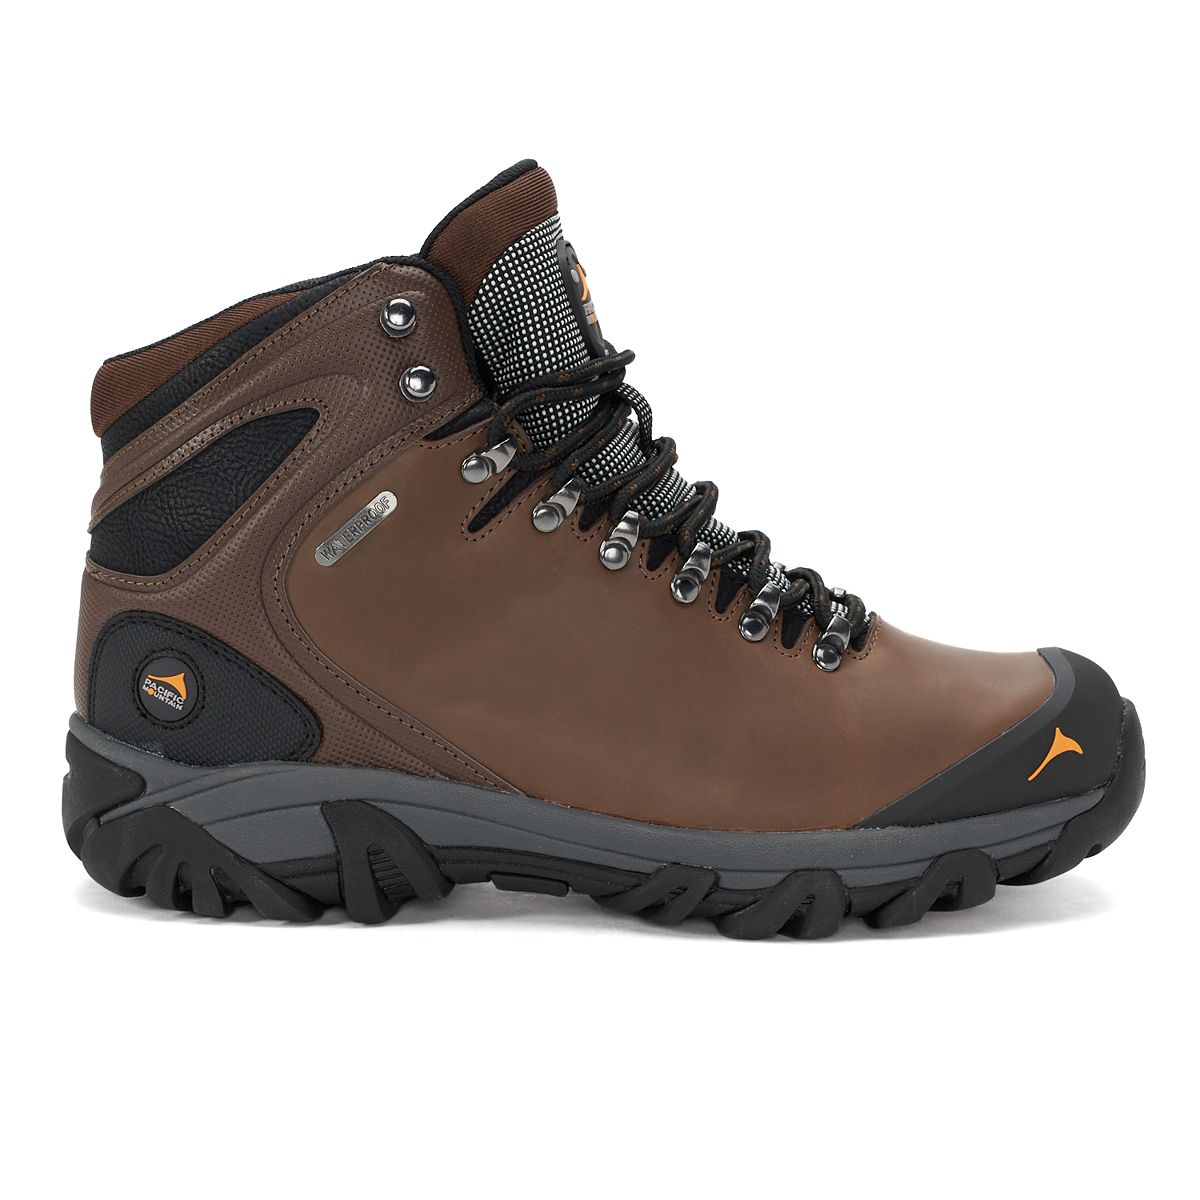 Pacific Mountain Elbert Men's Waterproof Hiking Boots Brown 1EIol